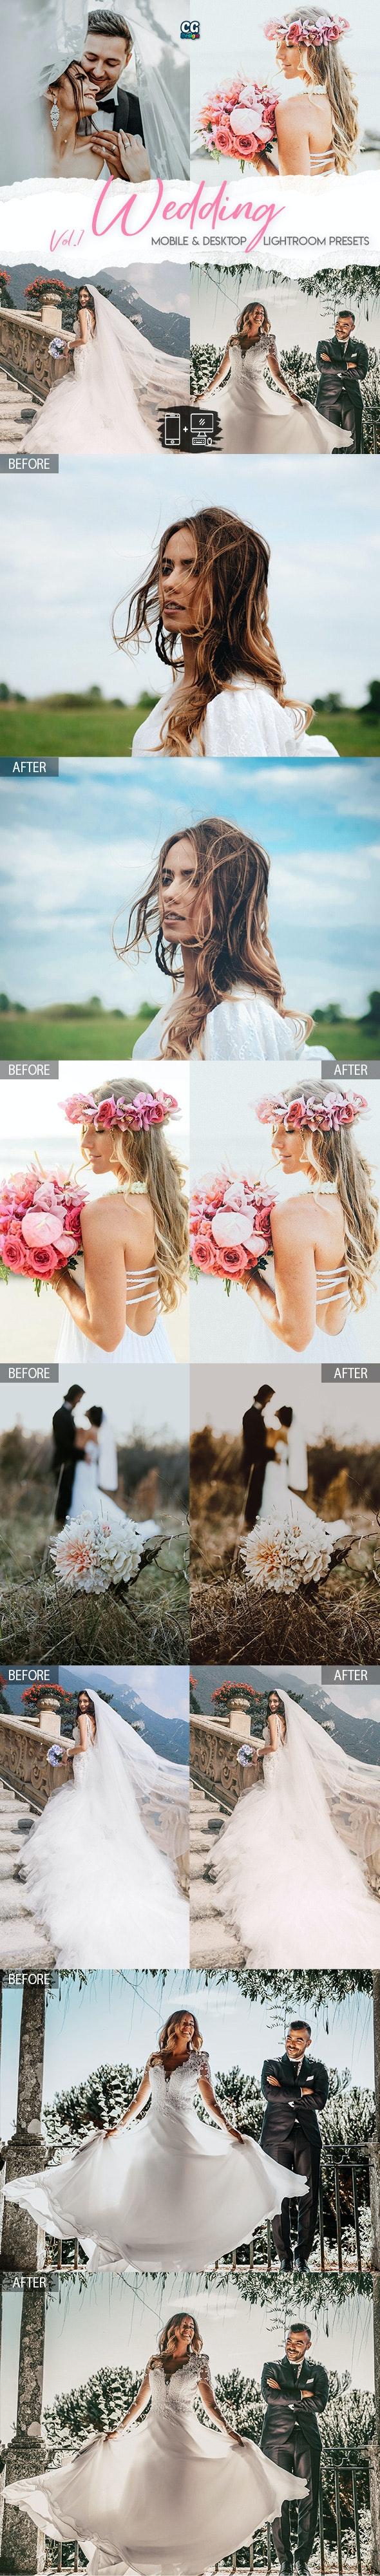 Wedding Lightroom Presets Vol. 1 - 15 Premium Lightroom Presets - Wedding Lightroom Presets